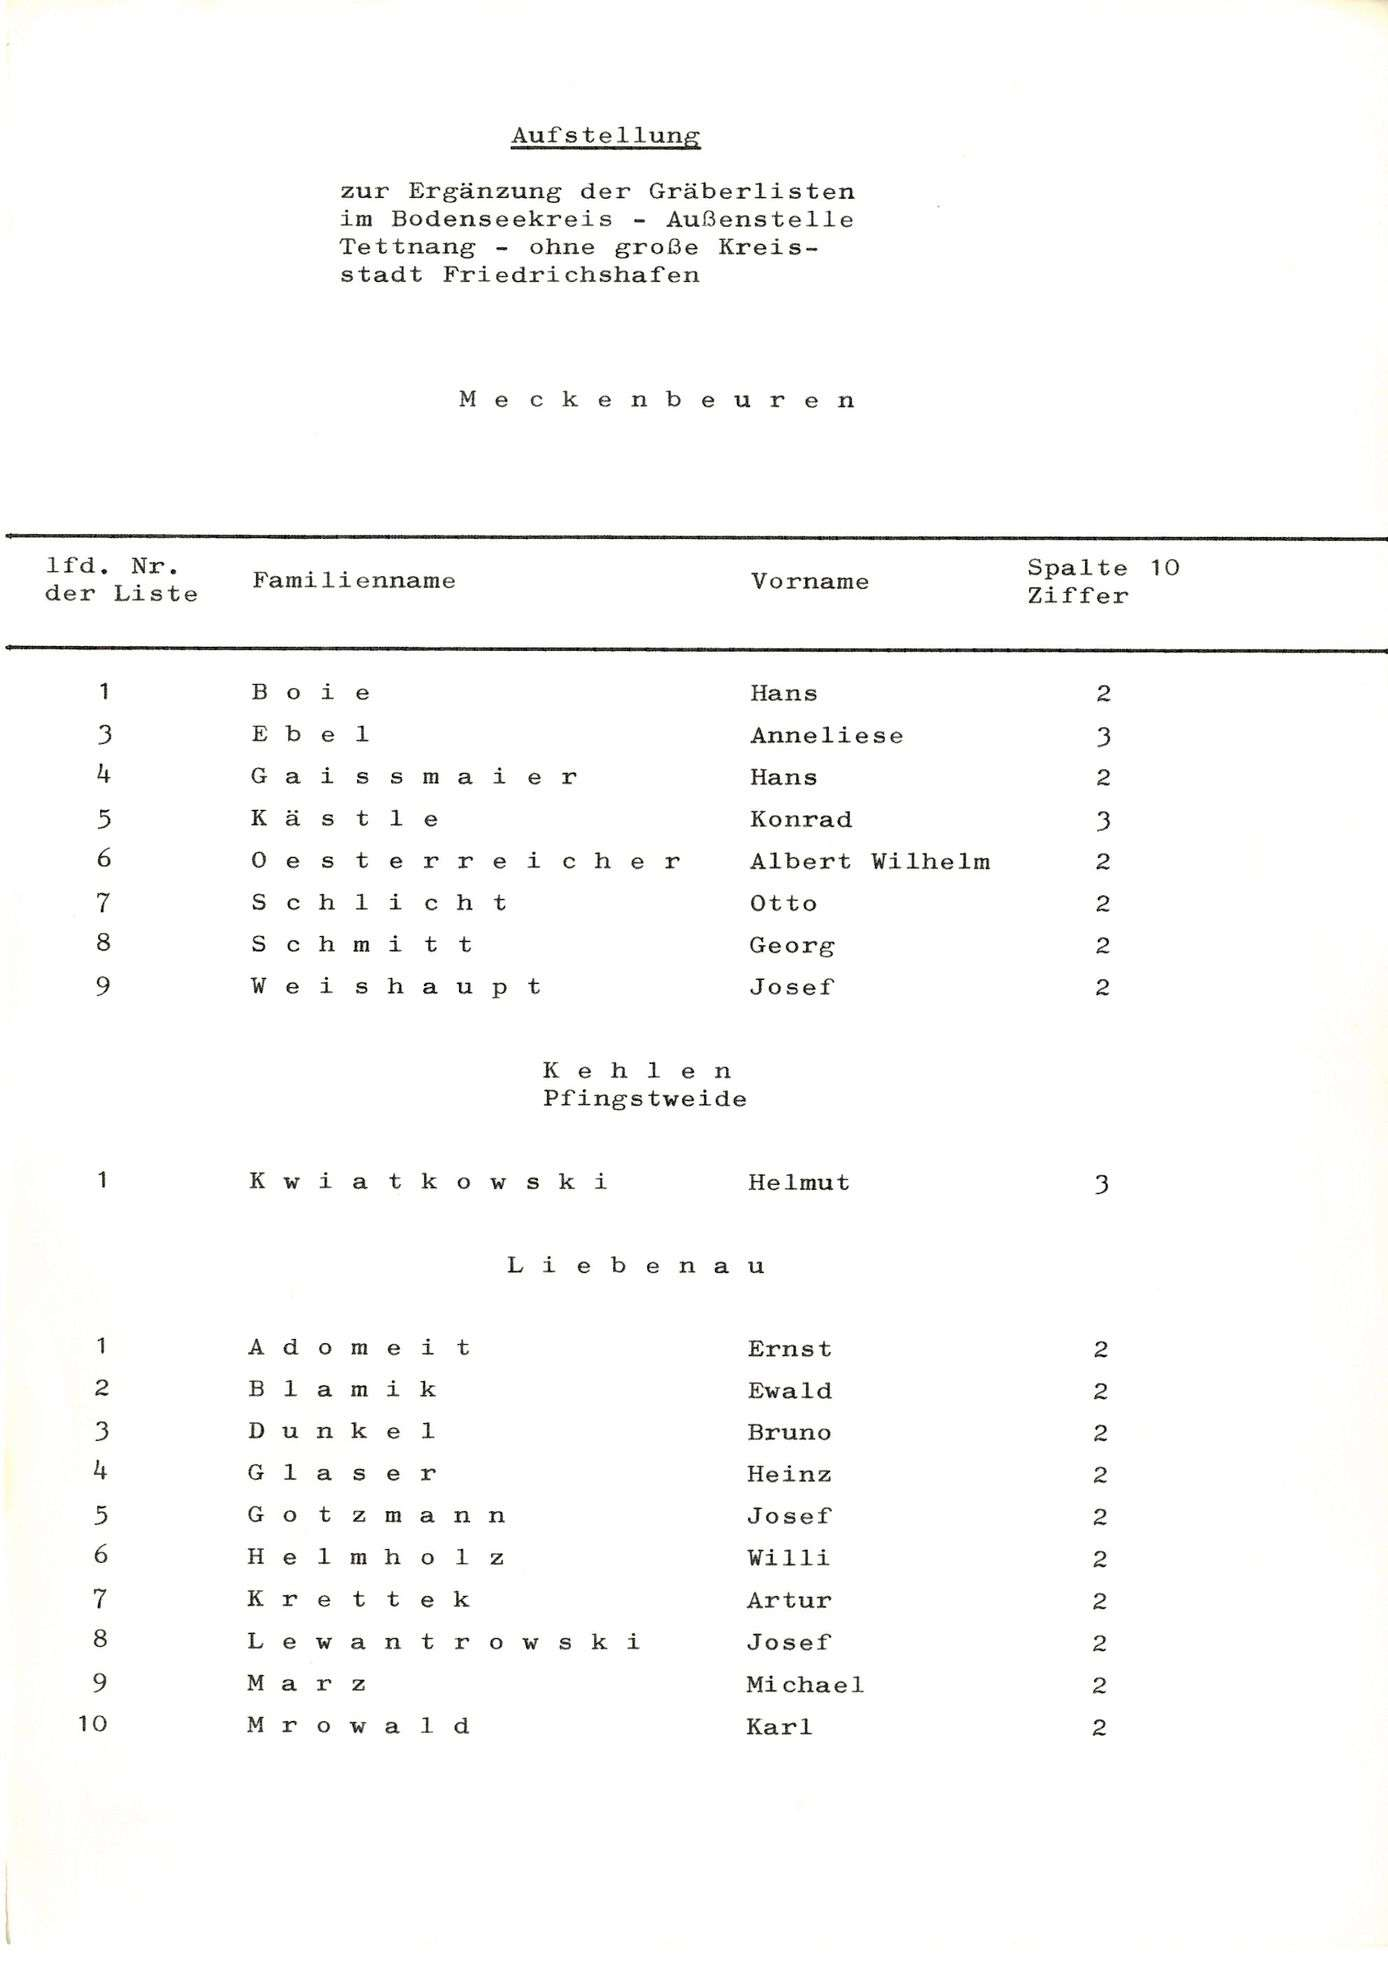 Meckenbeuren, Bild 3